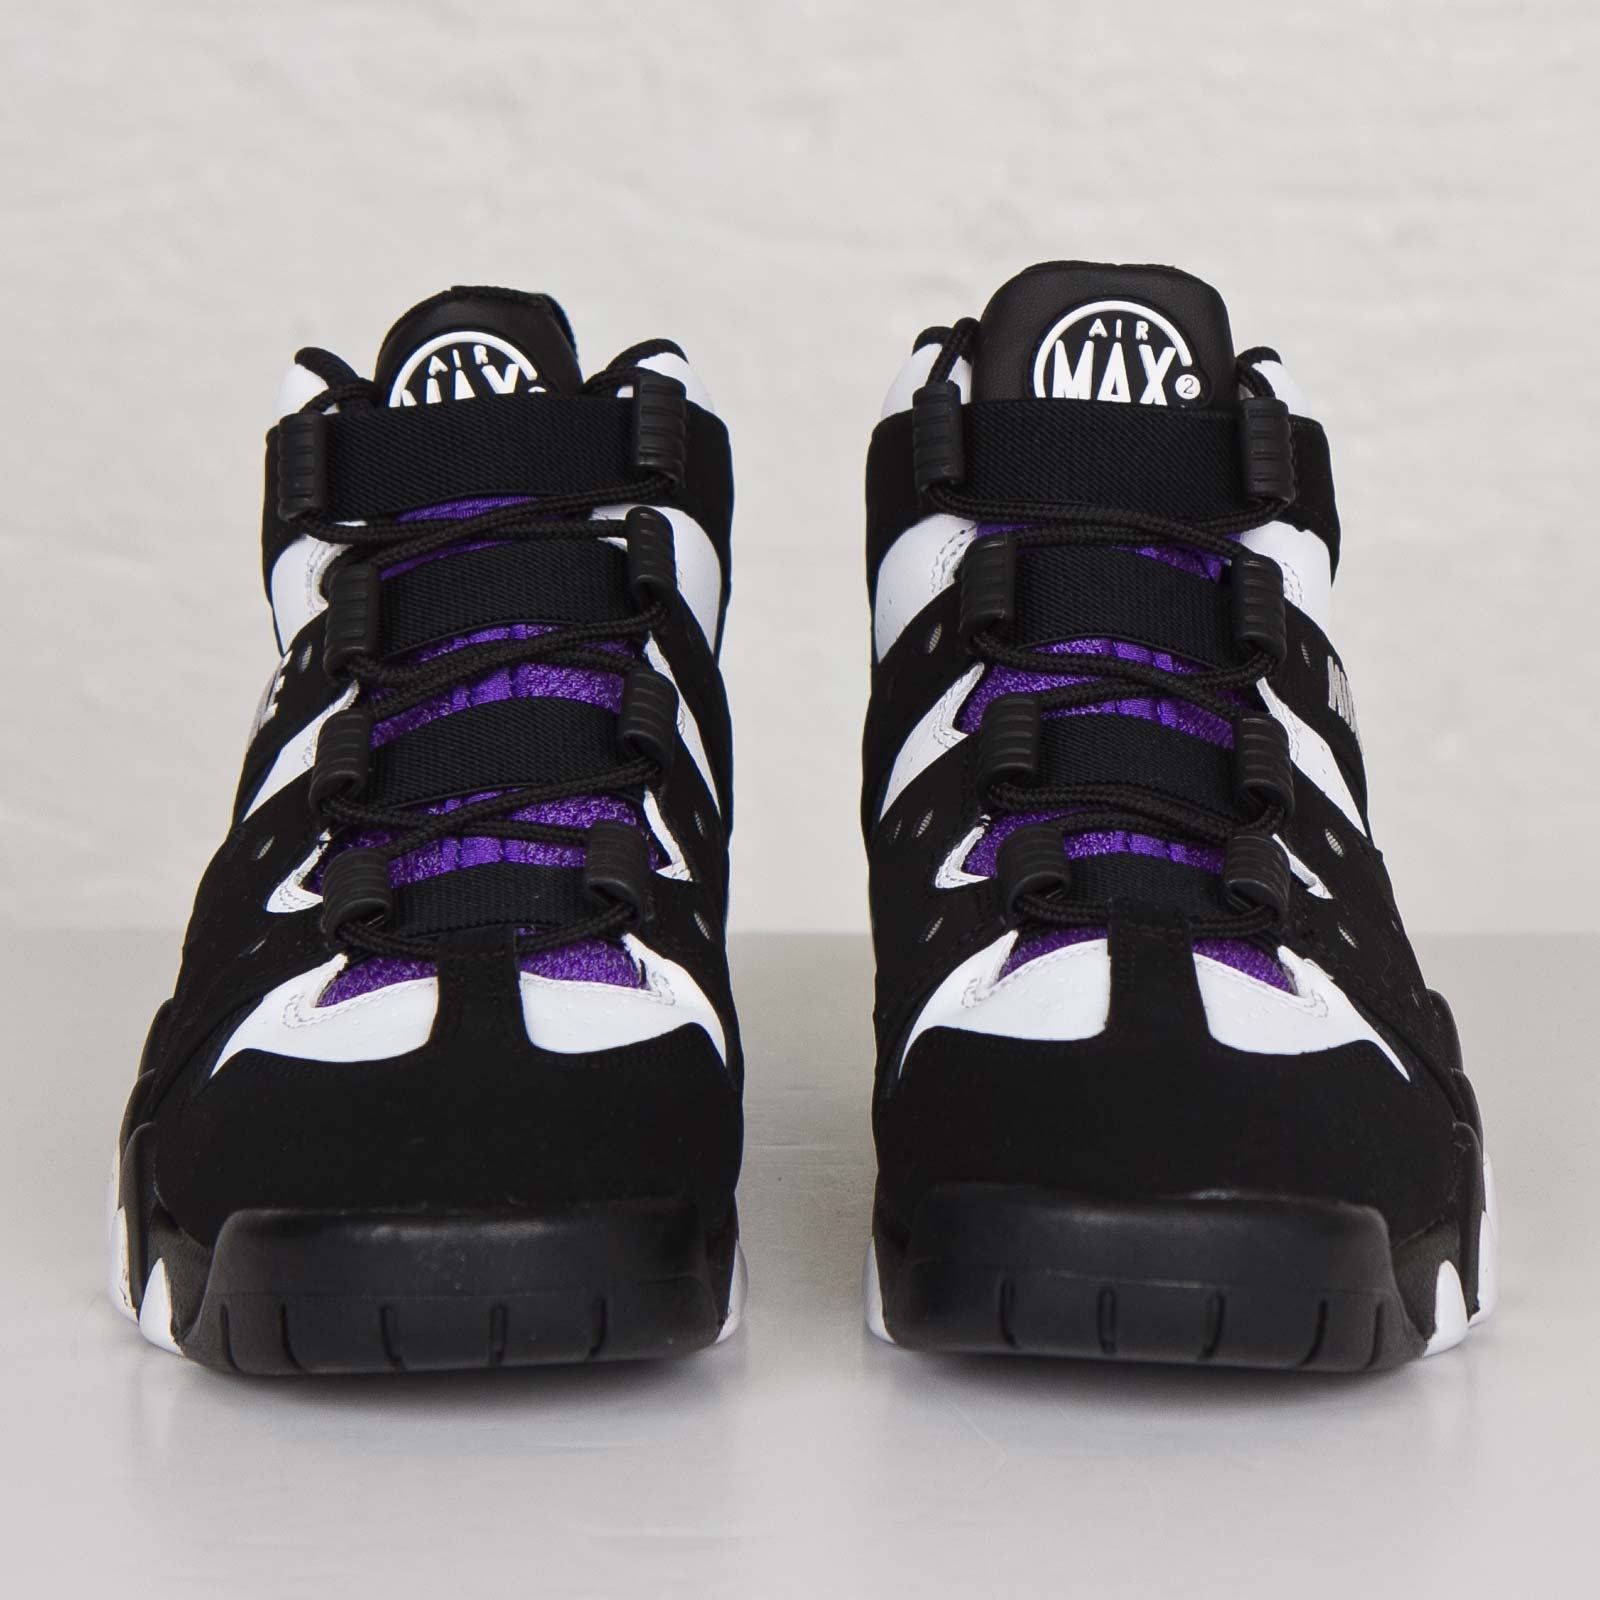 online retailer c6d8c 307bc Nike Air Max2 CB 94 - 305440-006 - Sneakersnstuff   sneakers   streetwear  online since 1999